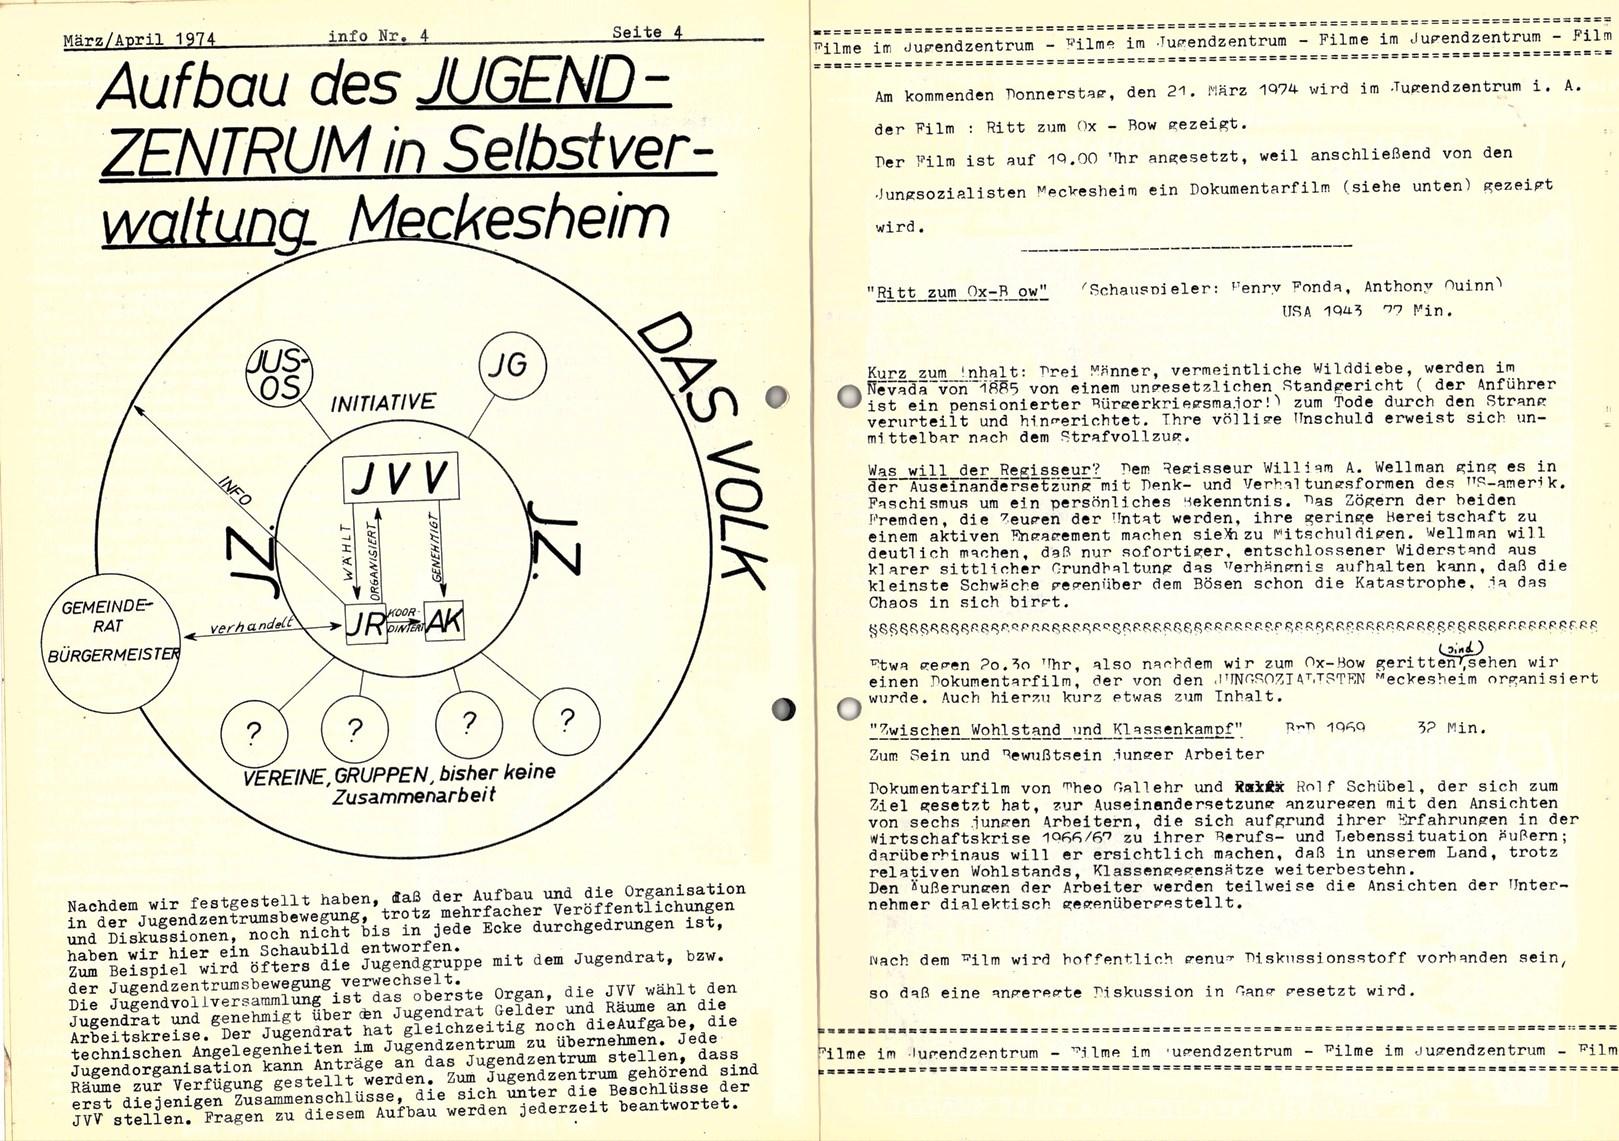 Meckesheim003